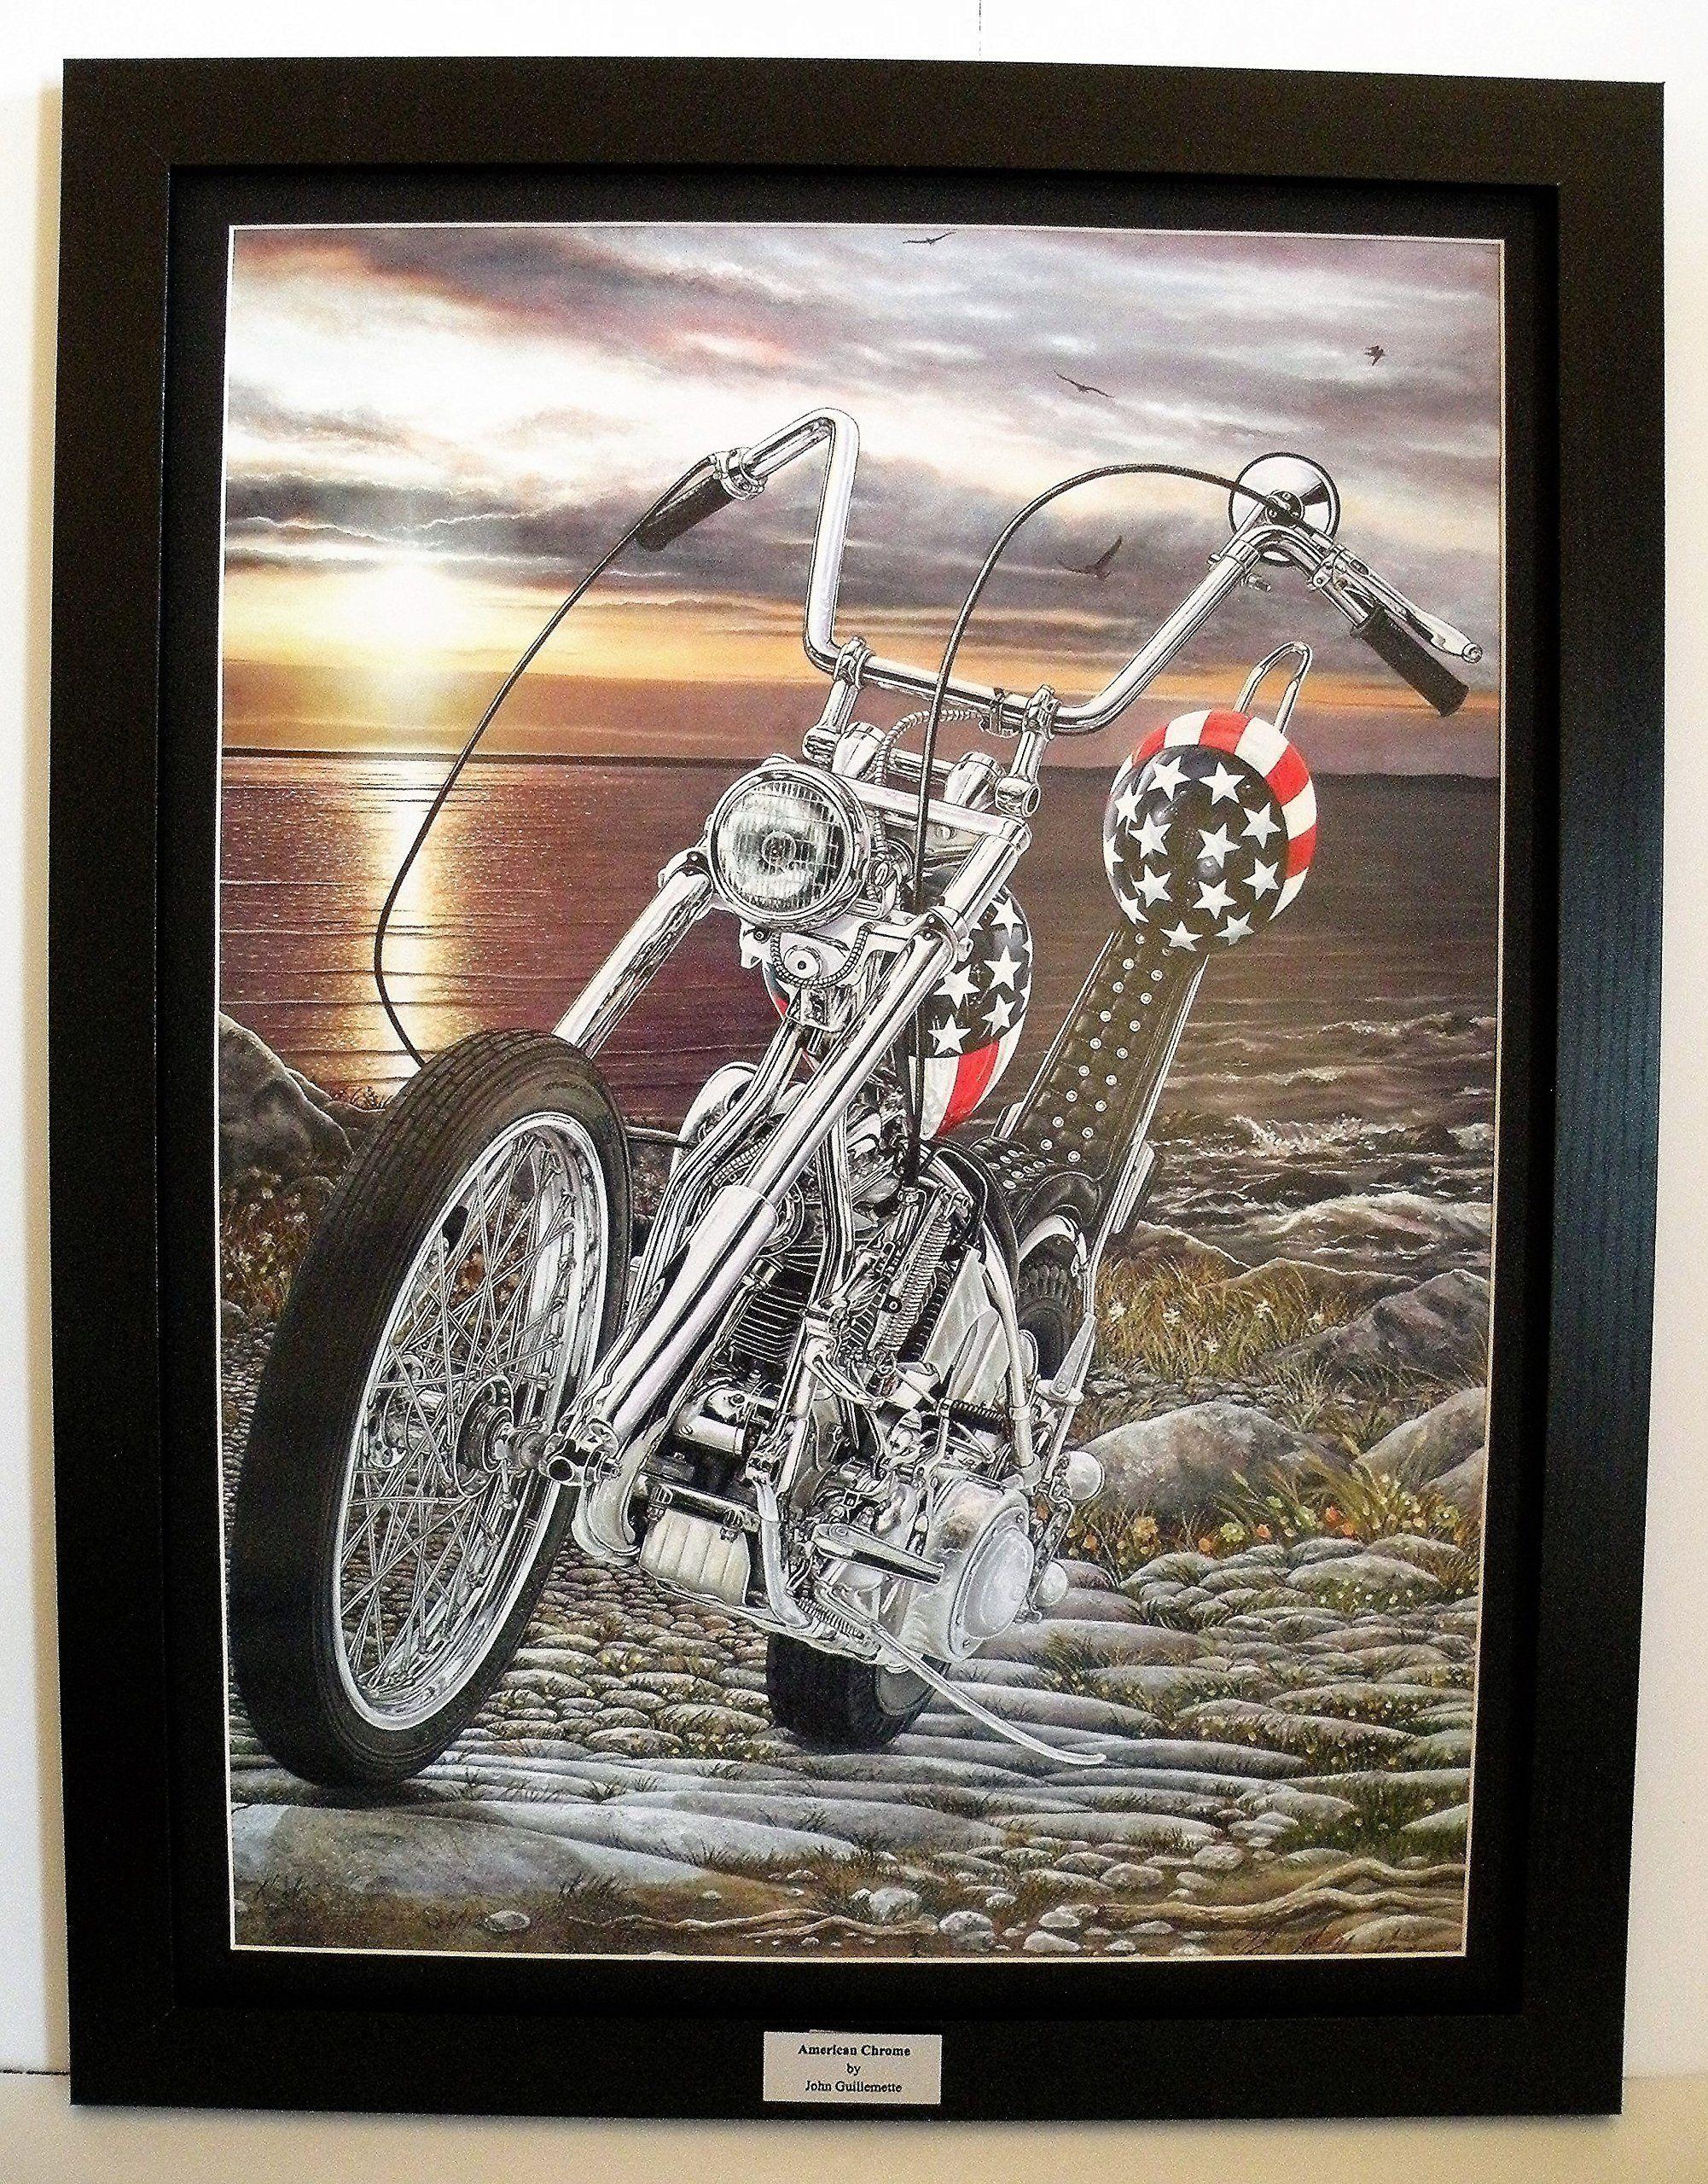 Easy Rider Harley Davidson Chopper, Vivid Sunset, Custom Framed, 18 Part 74